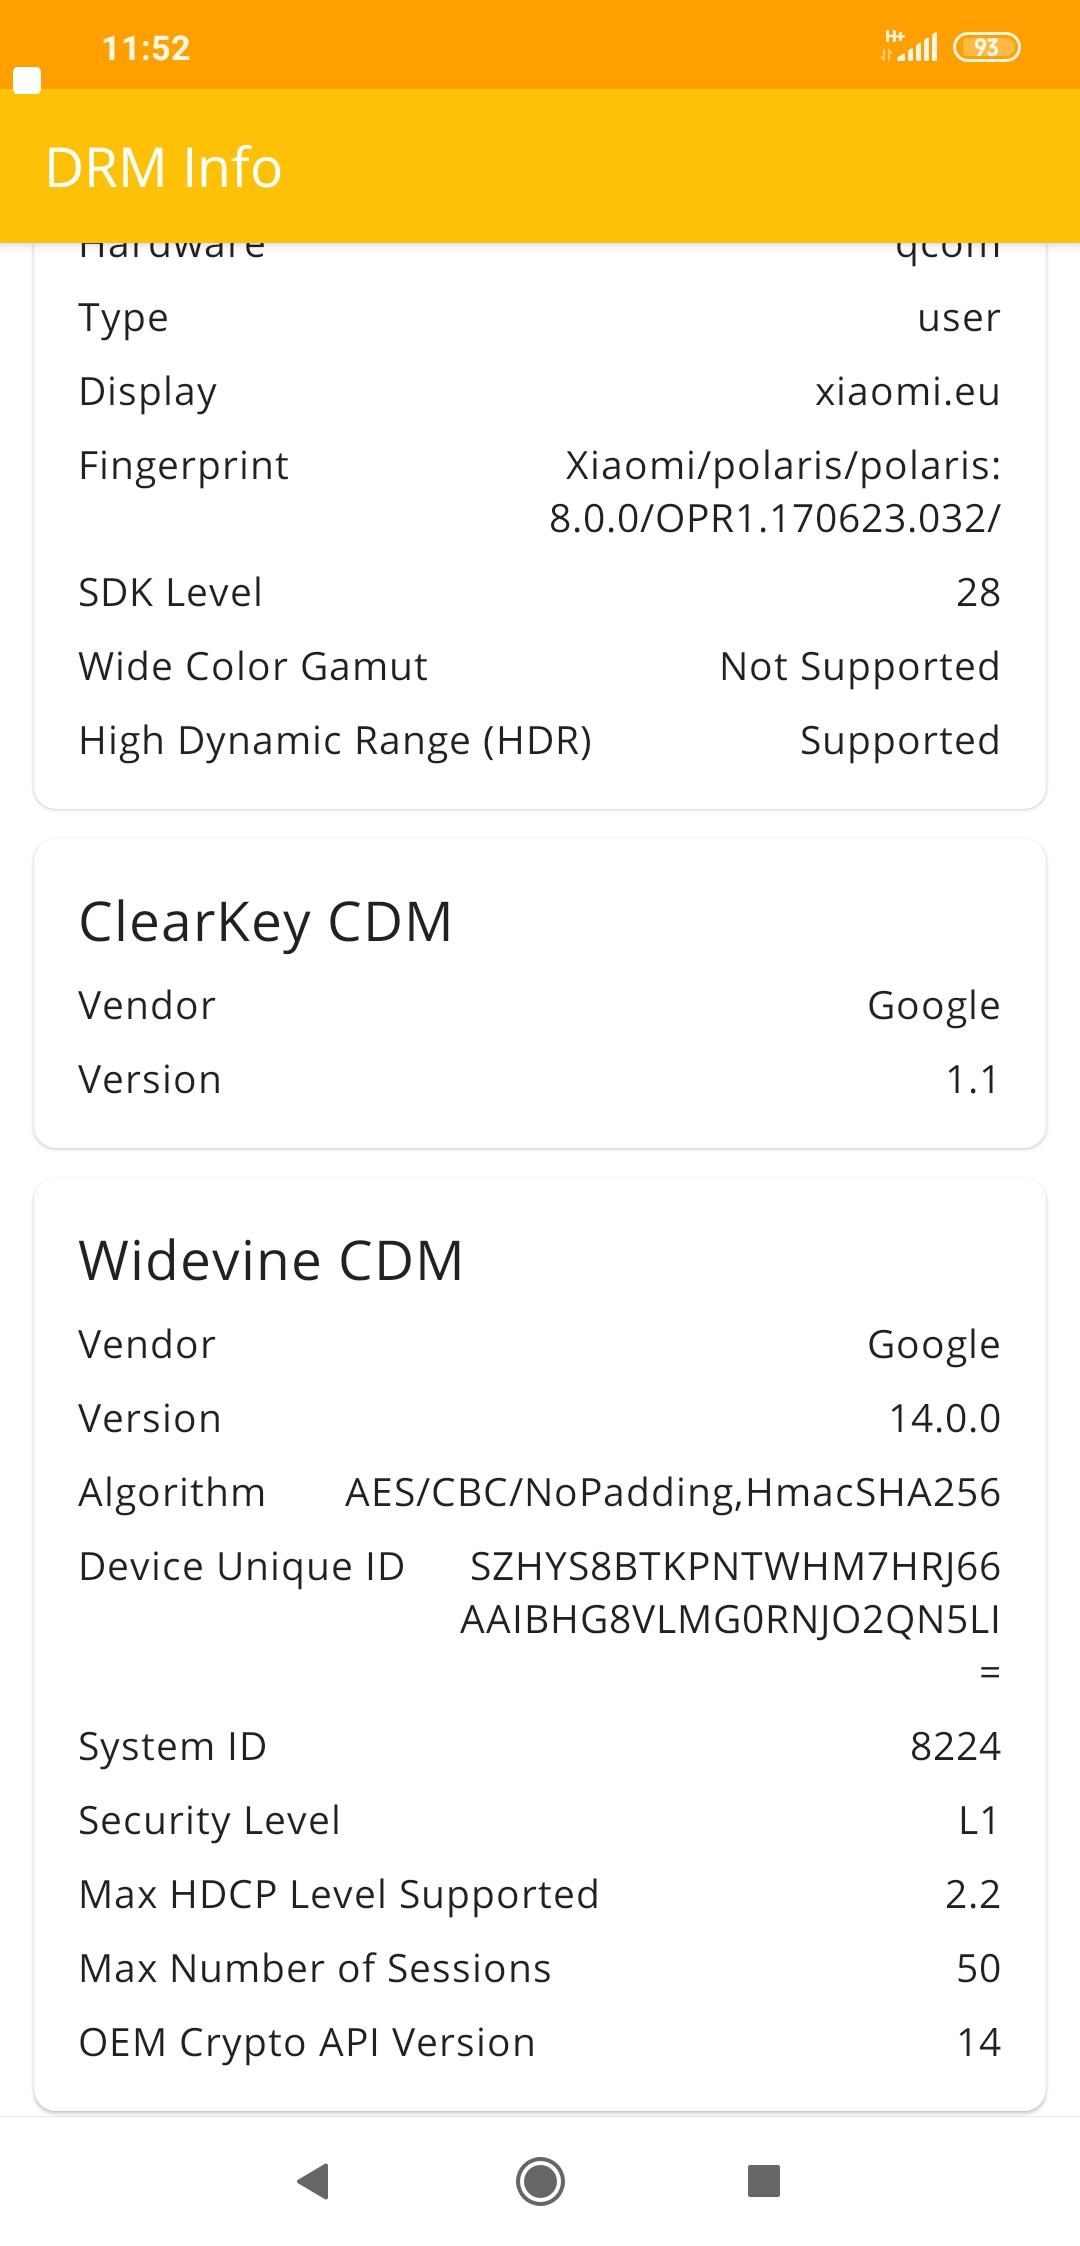 Screenshot_2019-06-16-11-52-15-721_com.androidfung.drminfo.jpg